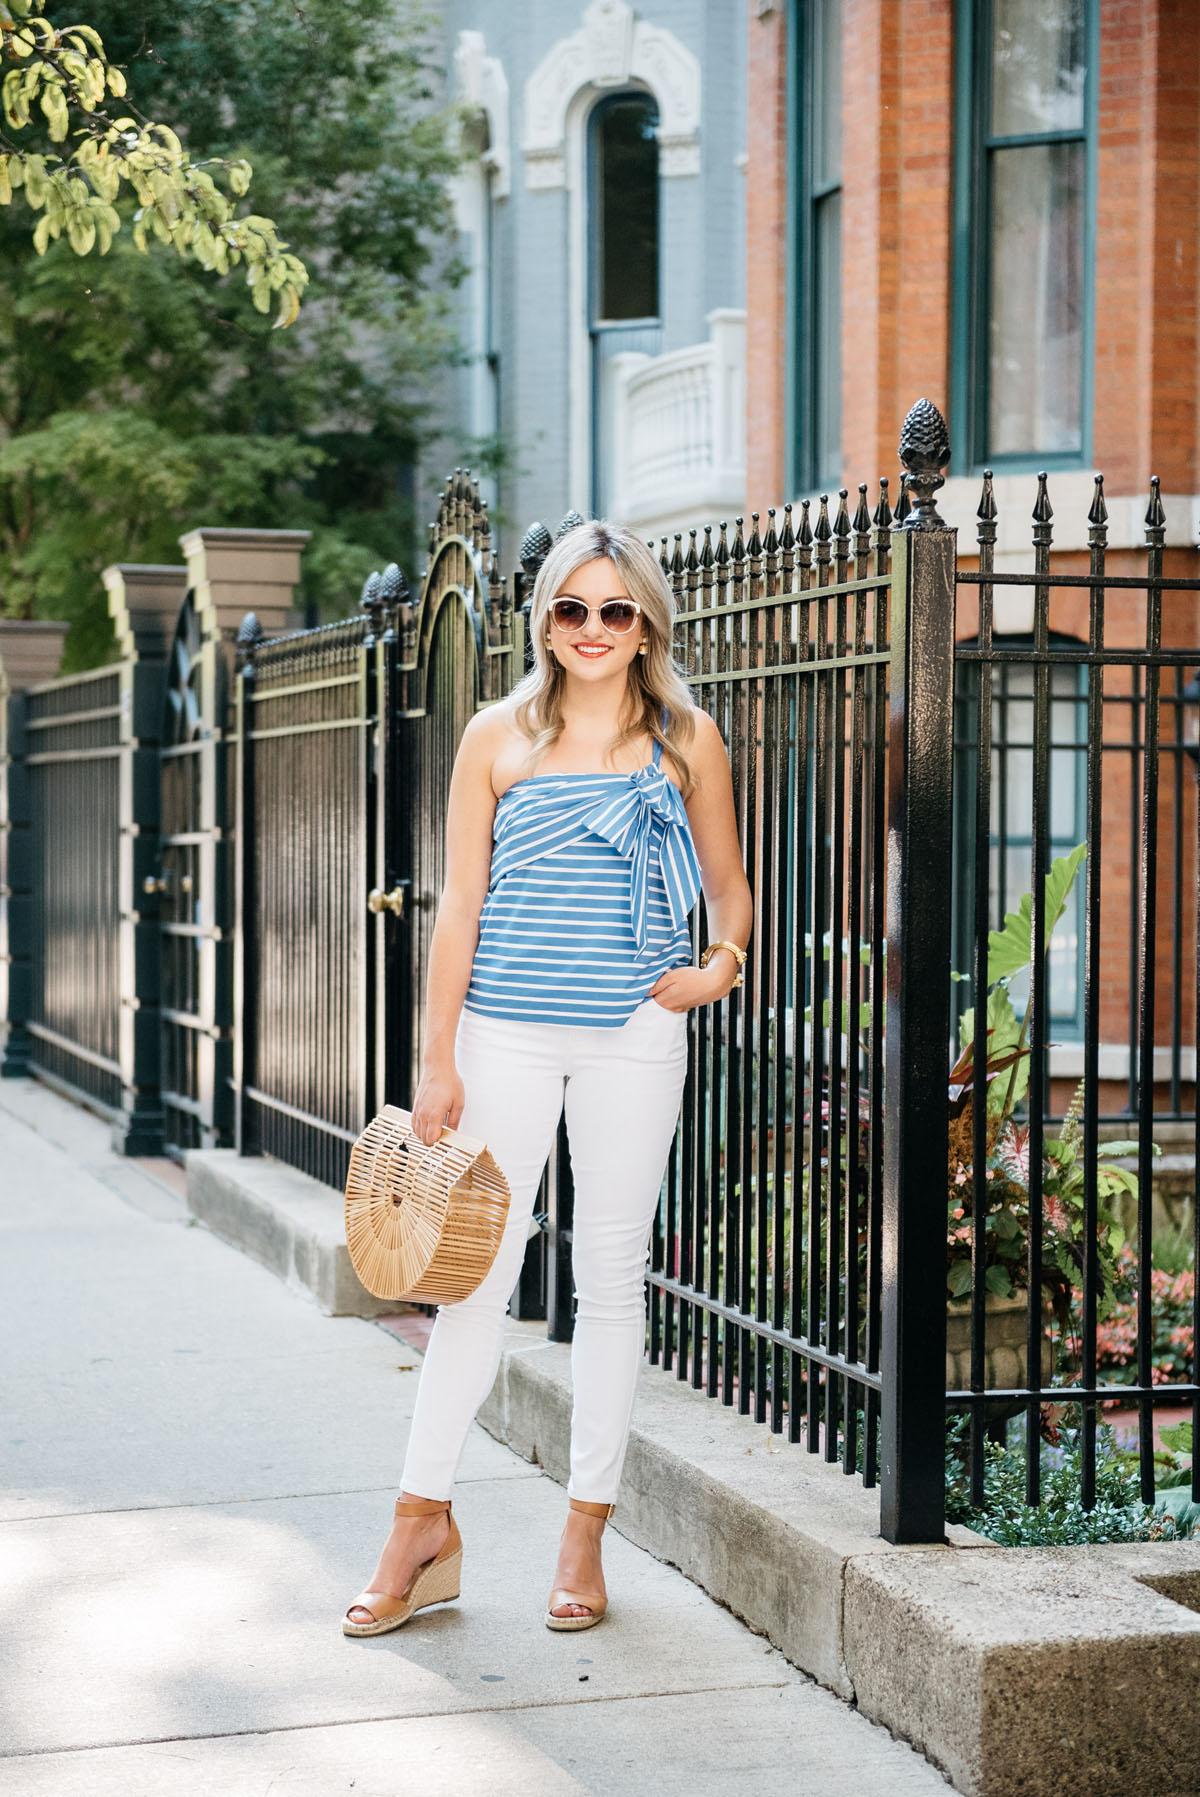 Bows & Sequins | Fashion Focused Lifestyle & Travel Blog